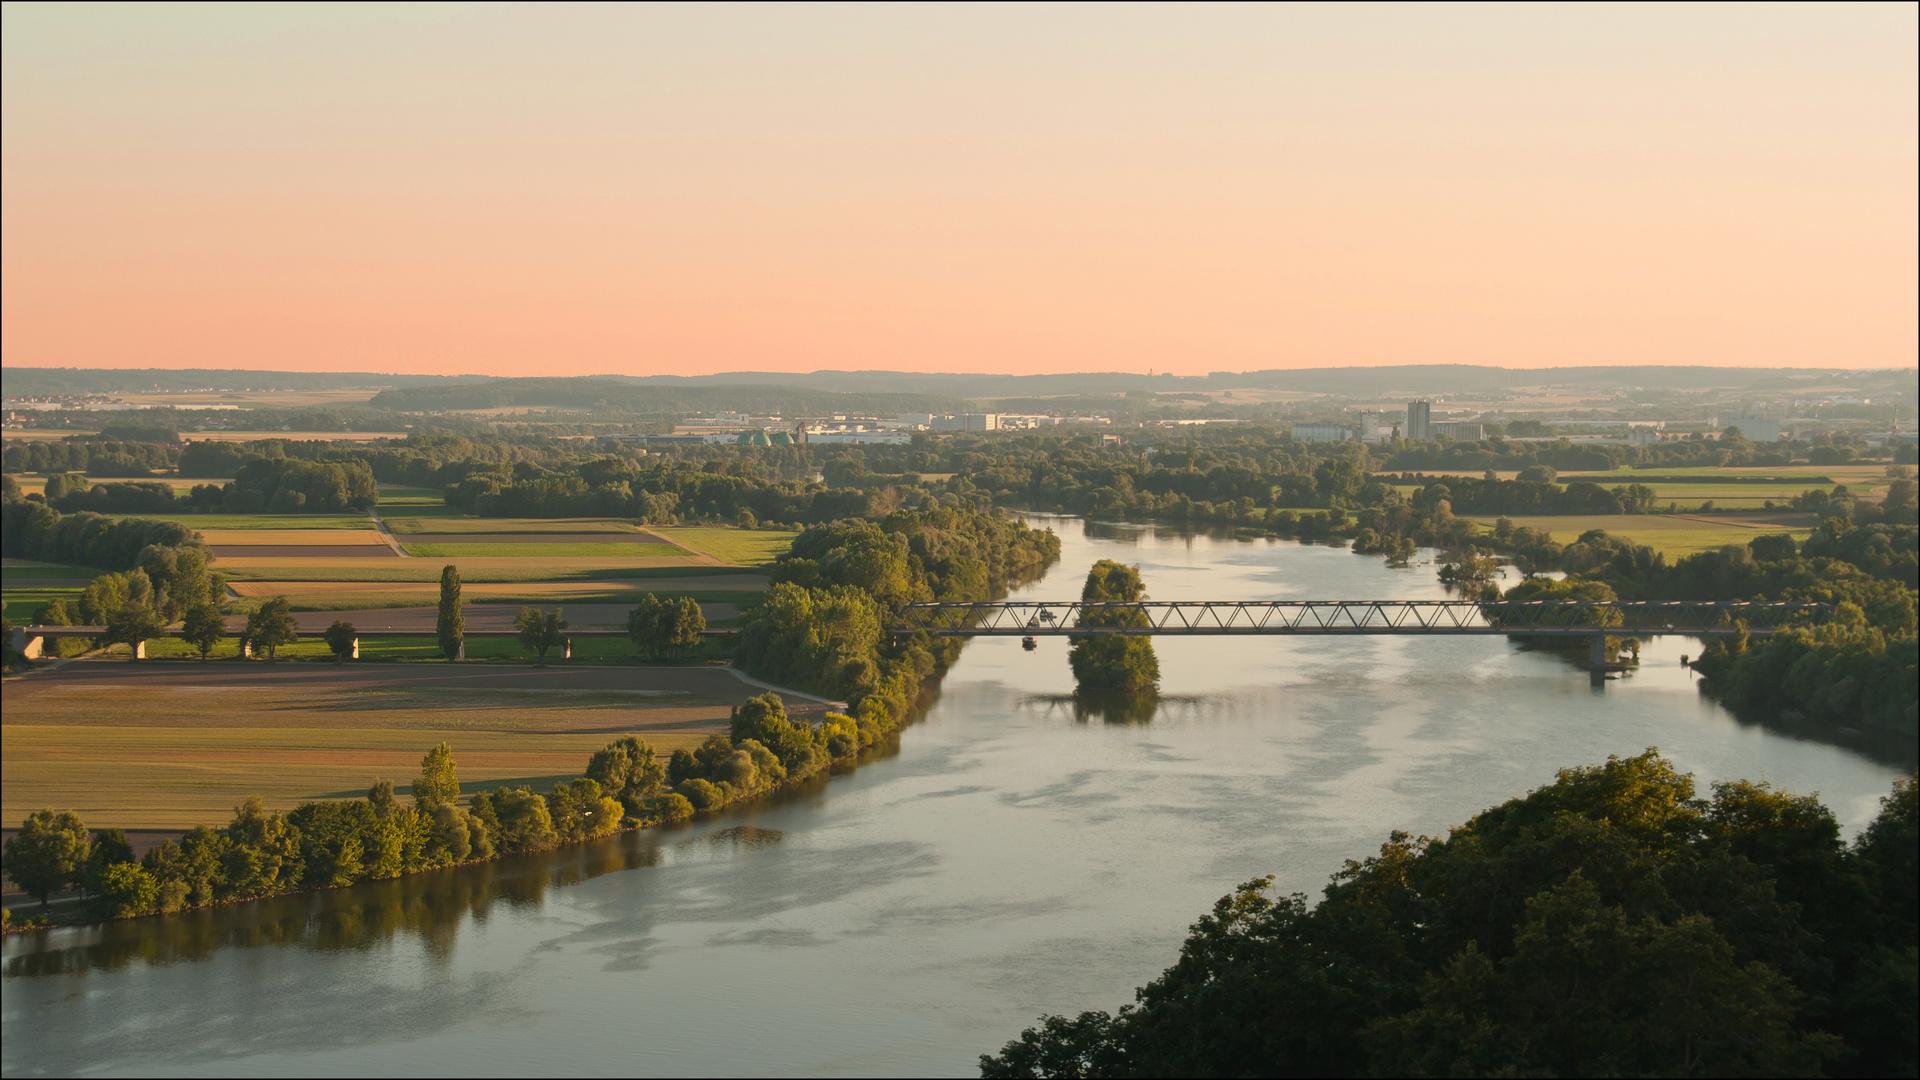 Sonnenuntergang an der Donau reloaded